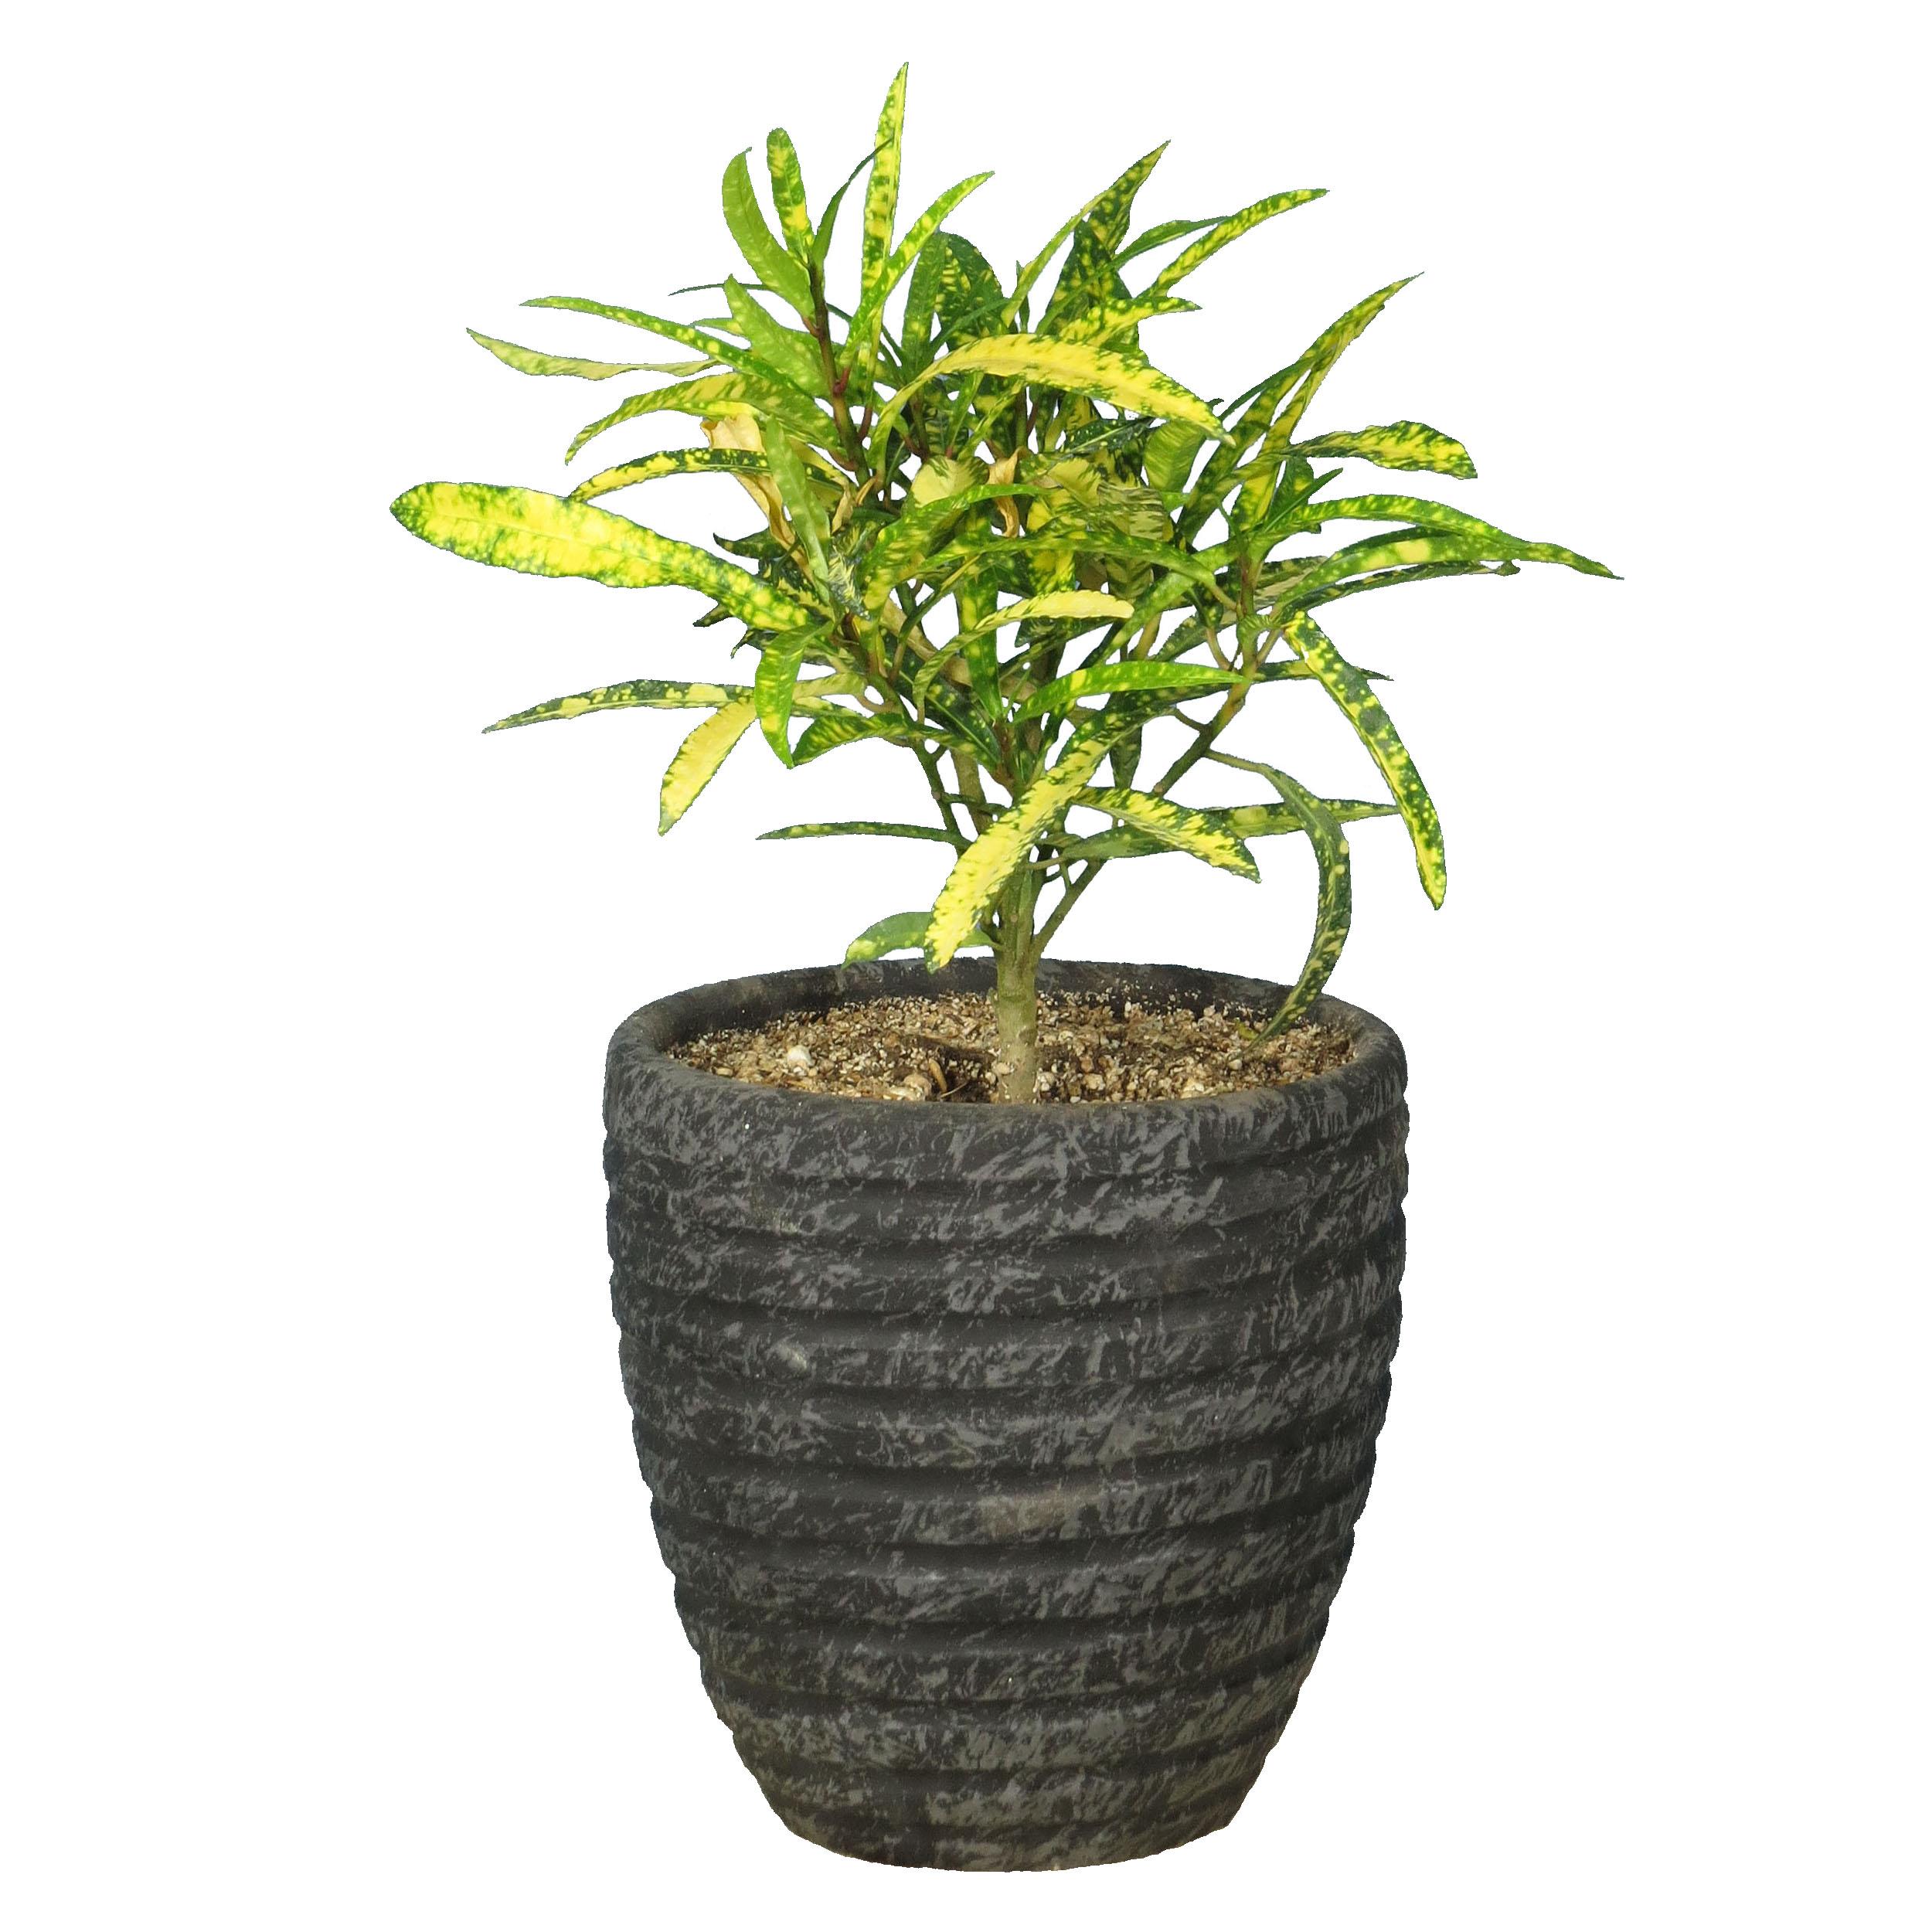 گیاه طبیعی آکوبا رشته ای کد AS-21